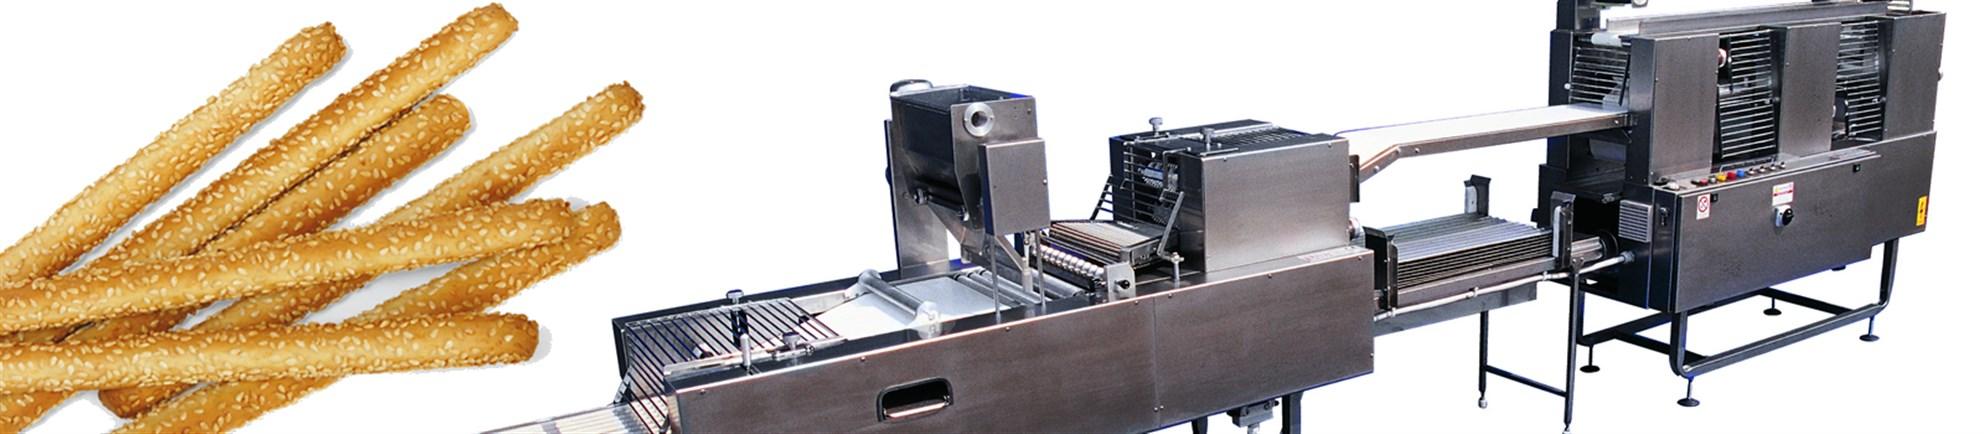 Automatic Kaak Line / Grissini